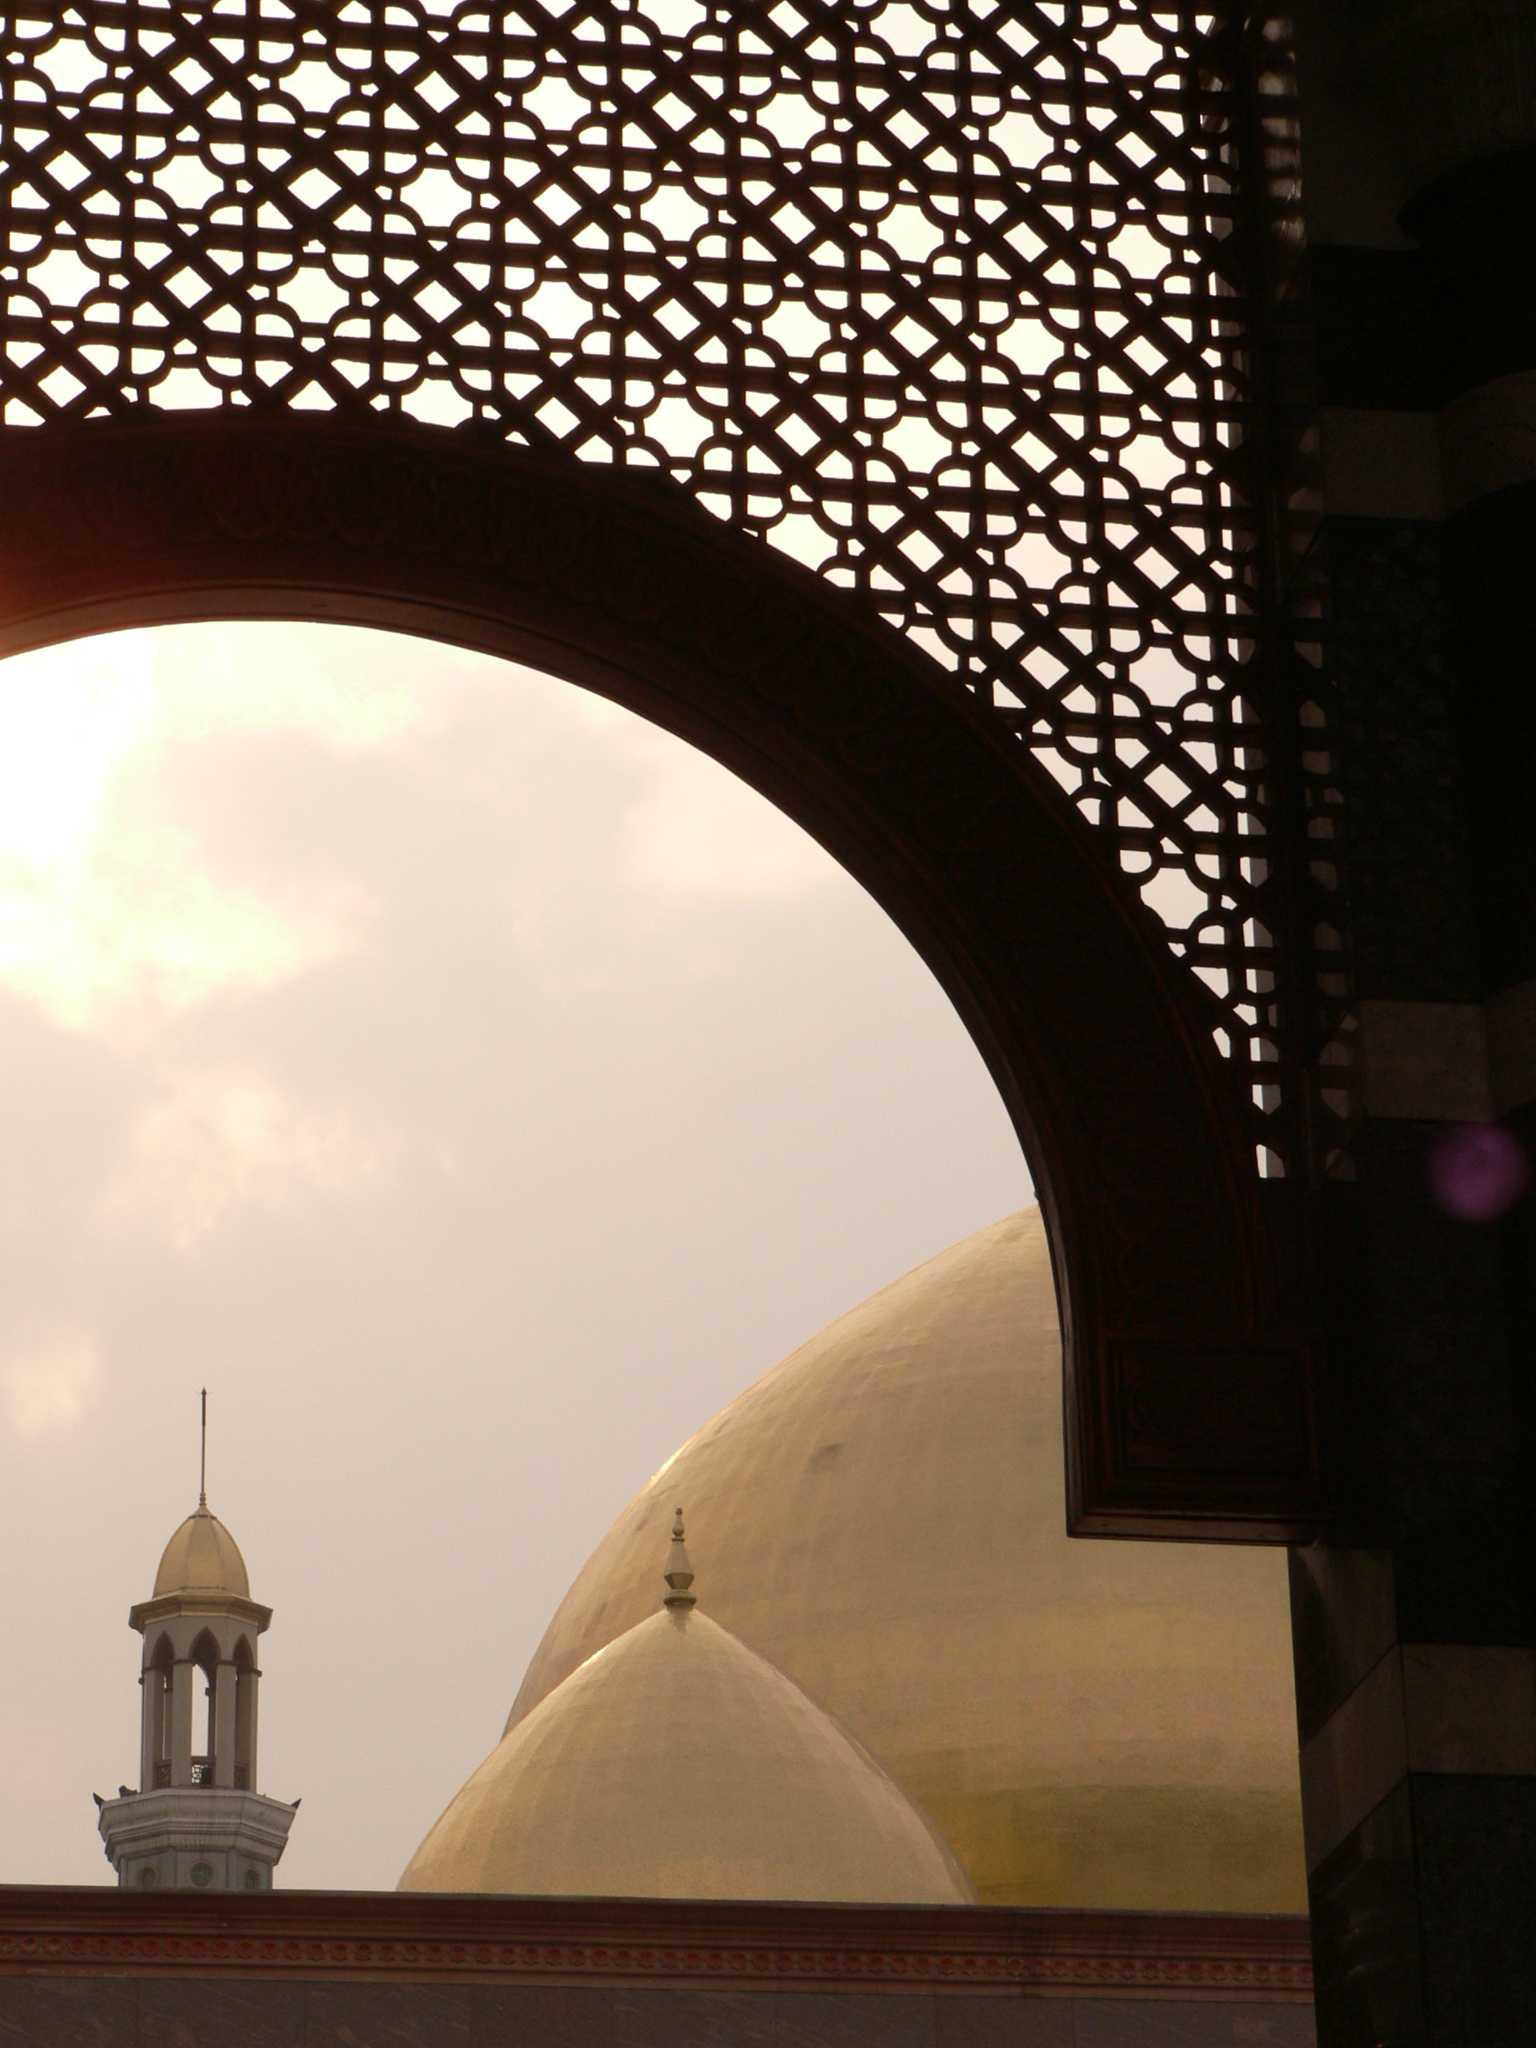 Pt. Garisprada Kubah Emas Mosque Meruyung, Limo, Depok City, West Java, Indonesia Depok P1080542 Klasik  22020